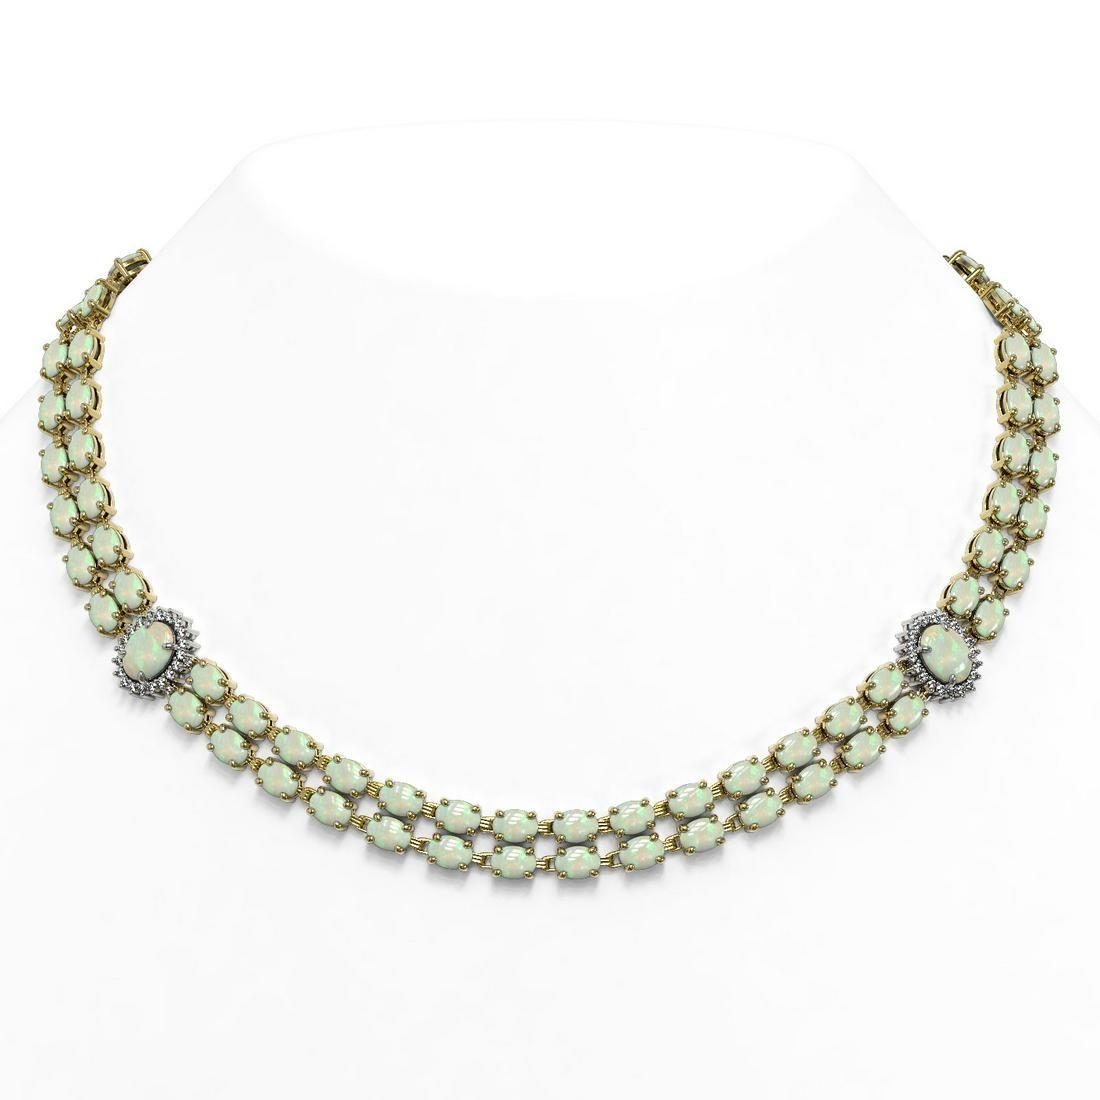 39.37 ctw Opal & Diamond Necklace 14K Yellow Gold -